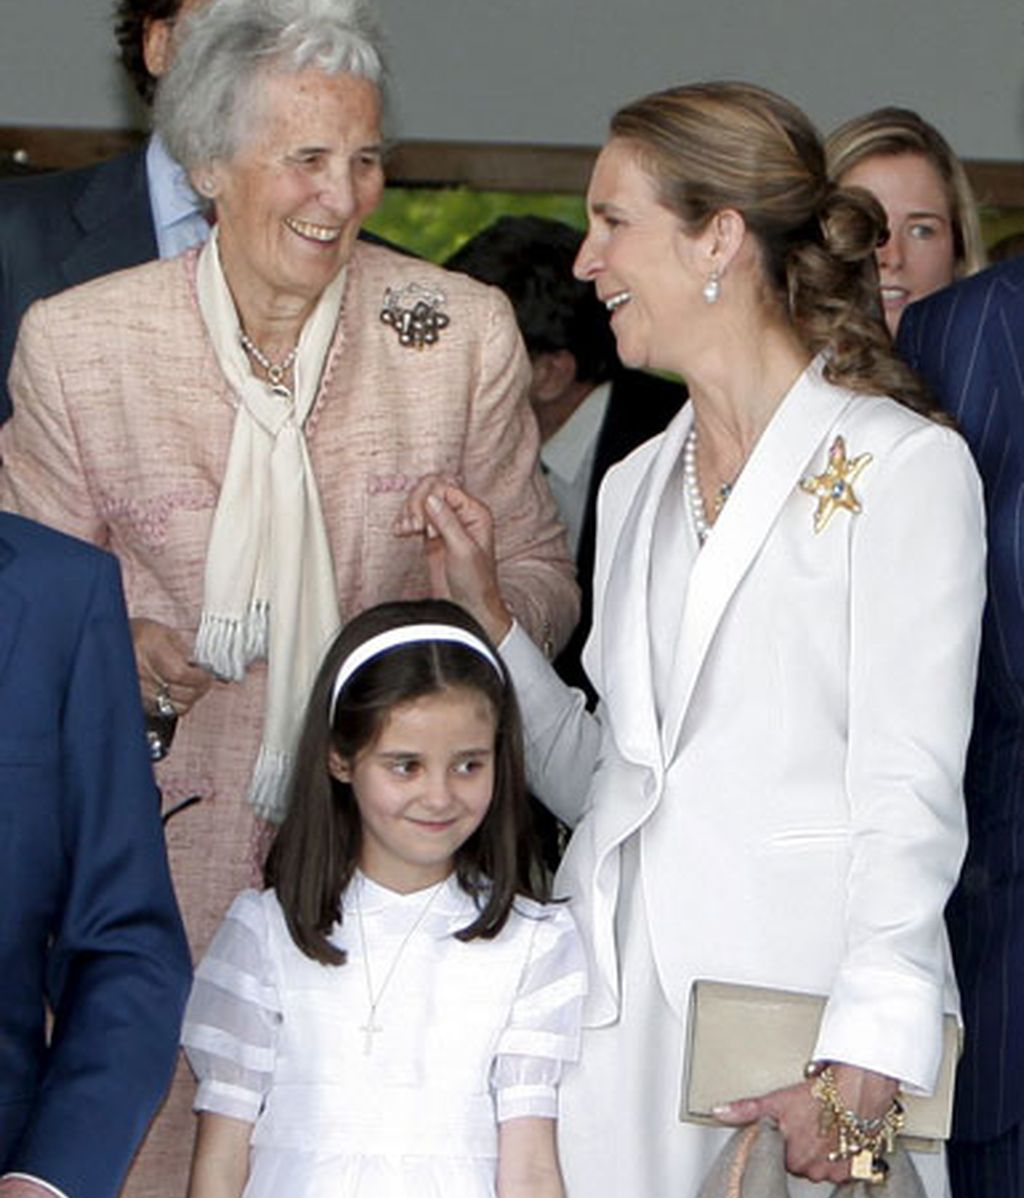 La Familia Real reunida en torno a Victoria Federica